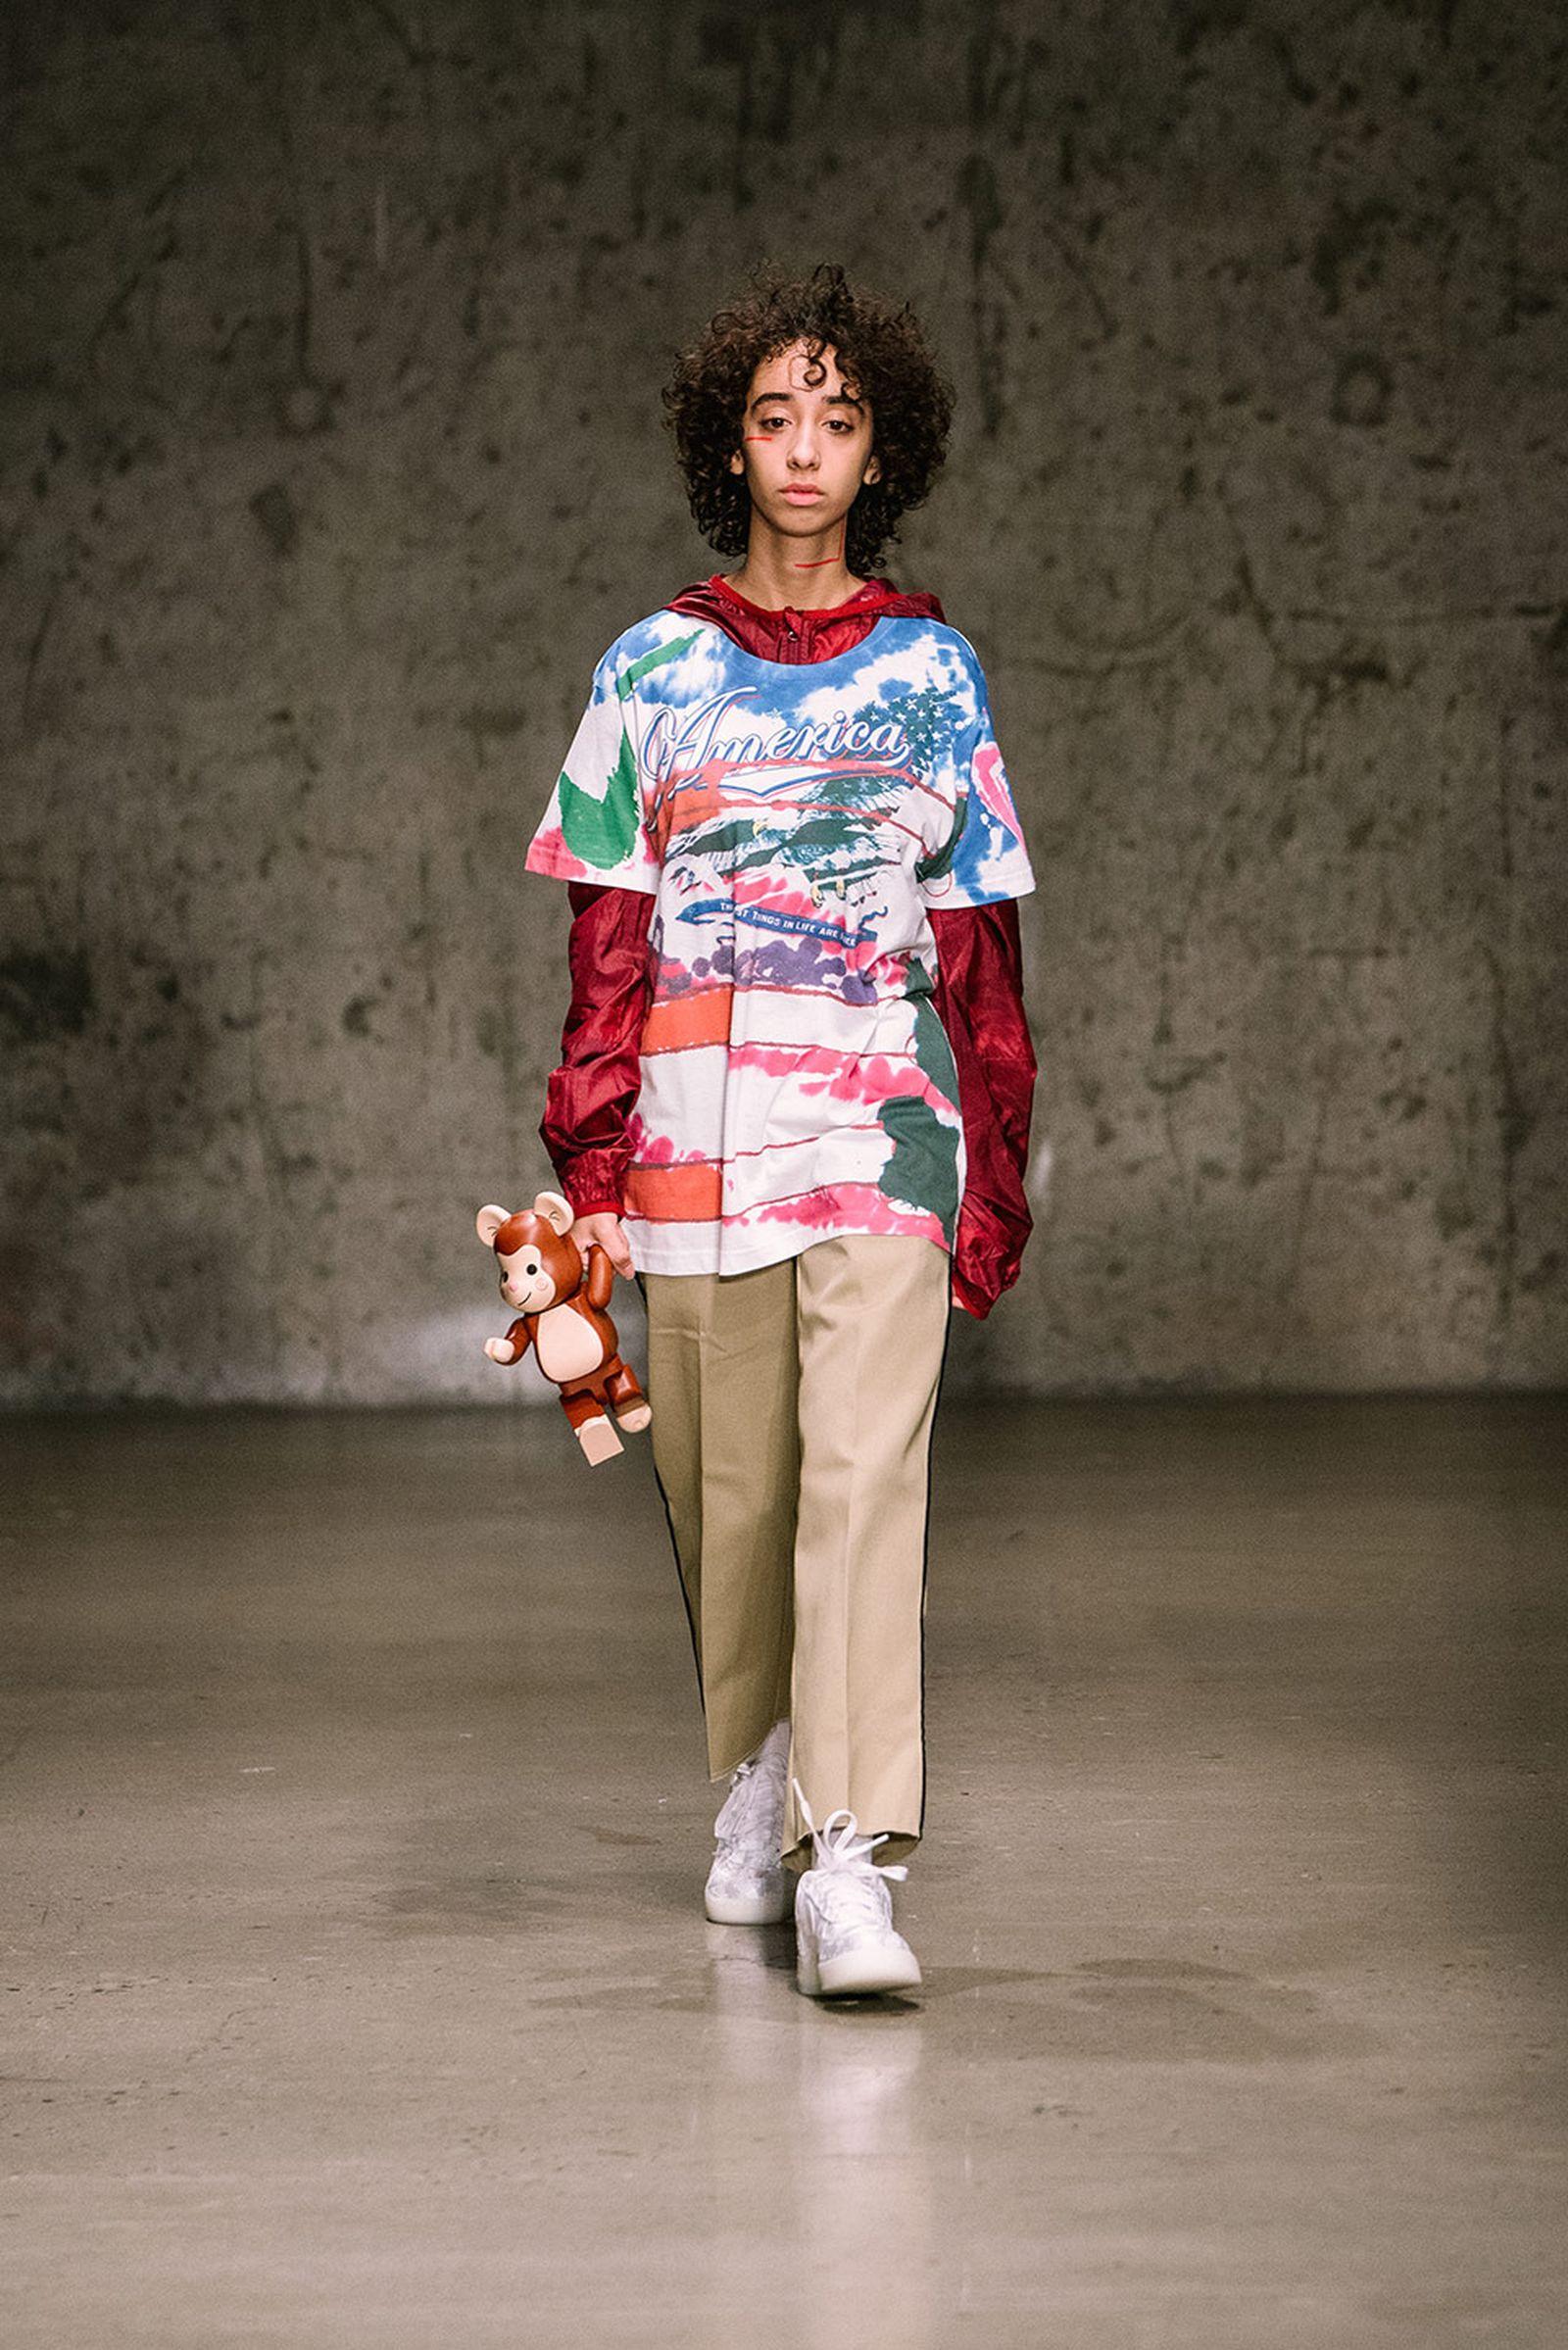 Clot Fall Winter 2018 Highsnobiety edison chen kevin poon new york fashion week